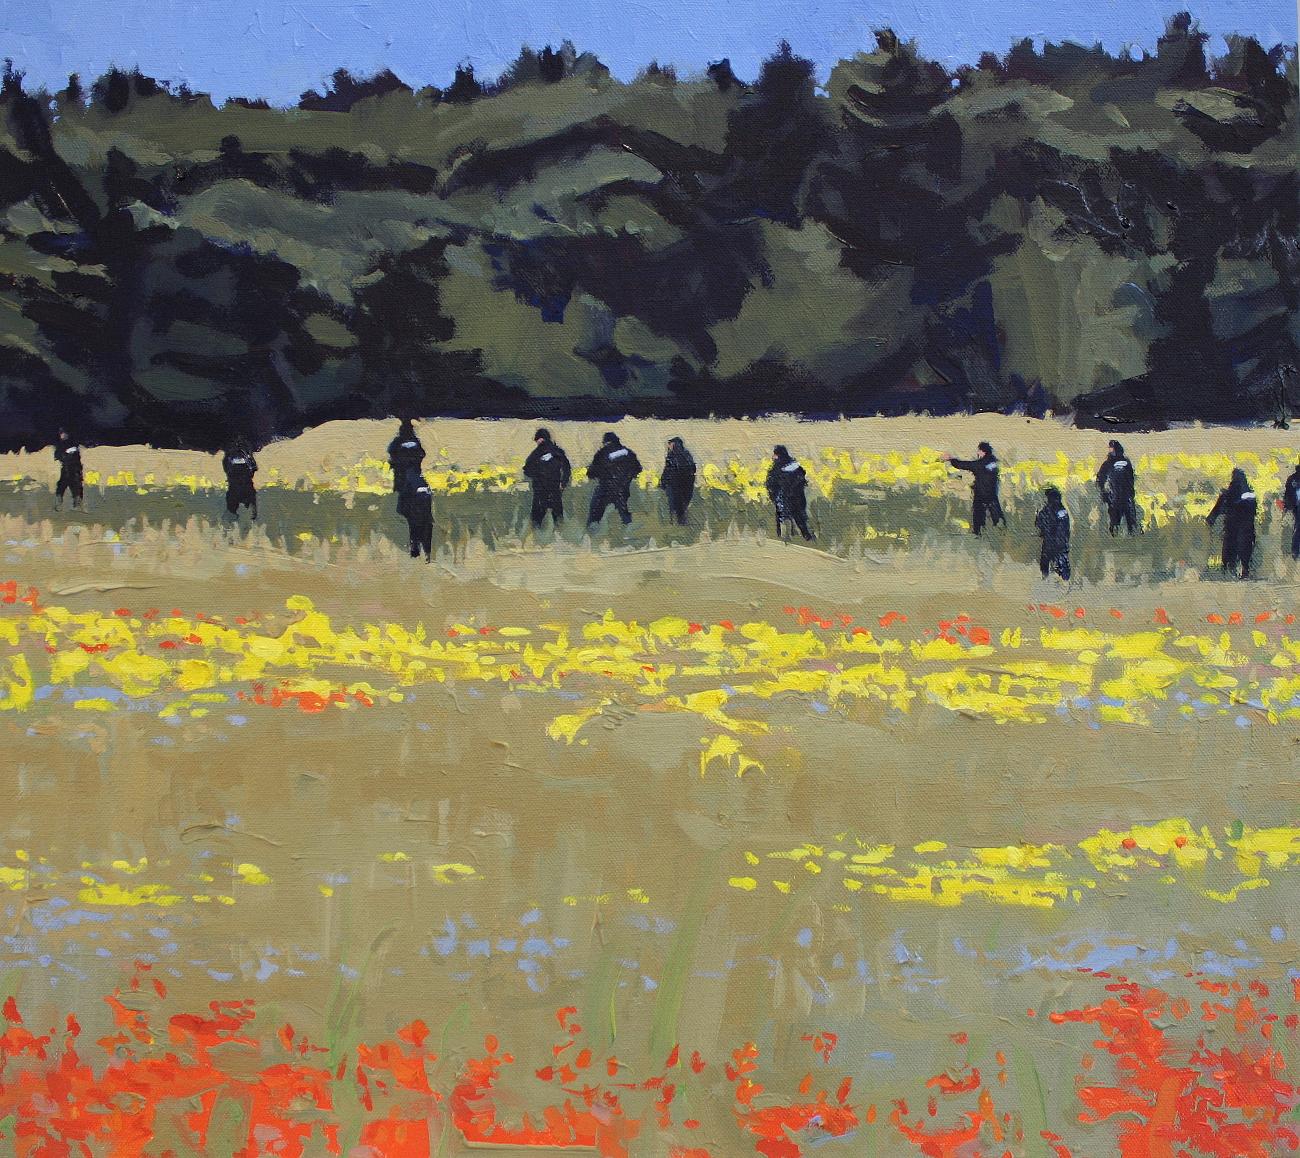 Roger Patrick,  Upstate Landscape 1 , 2016, oil on canvas